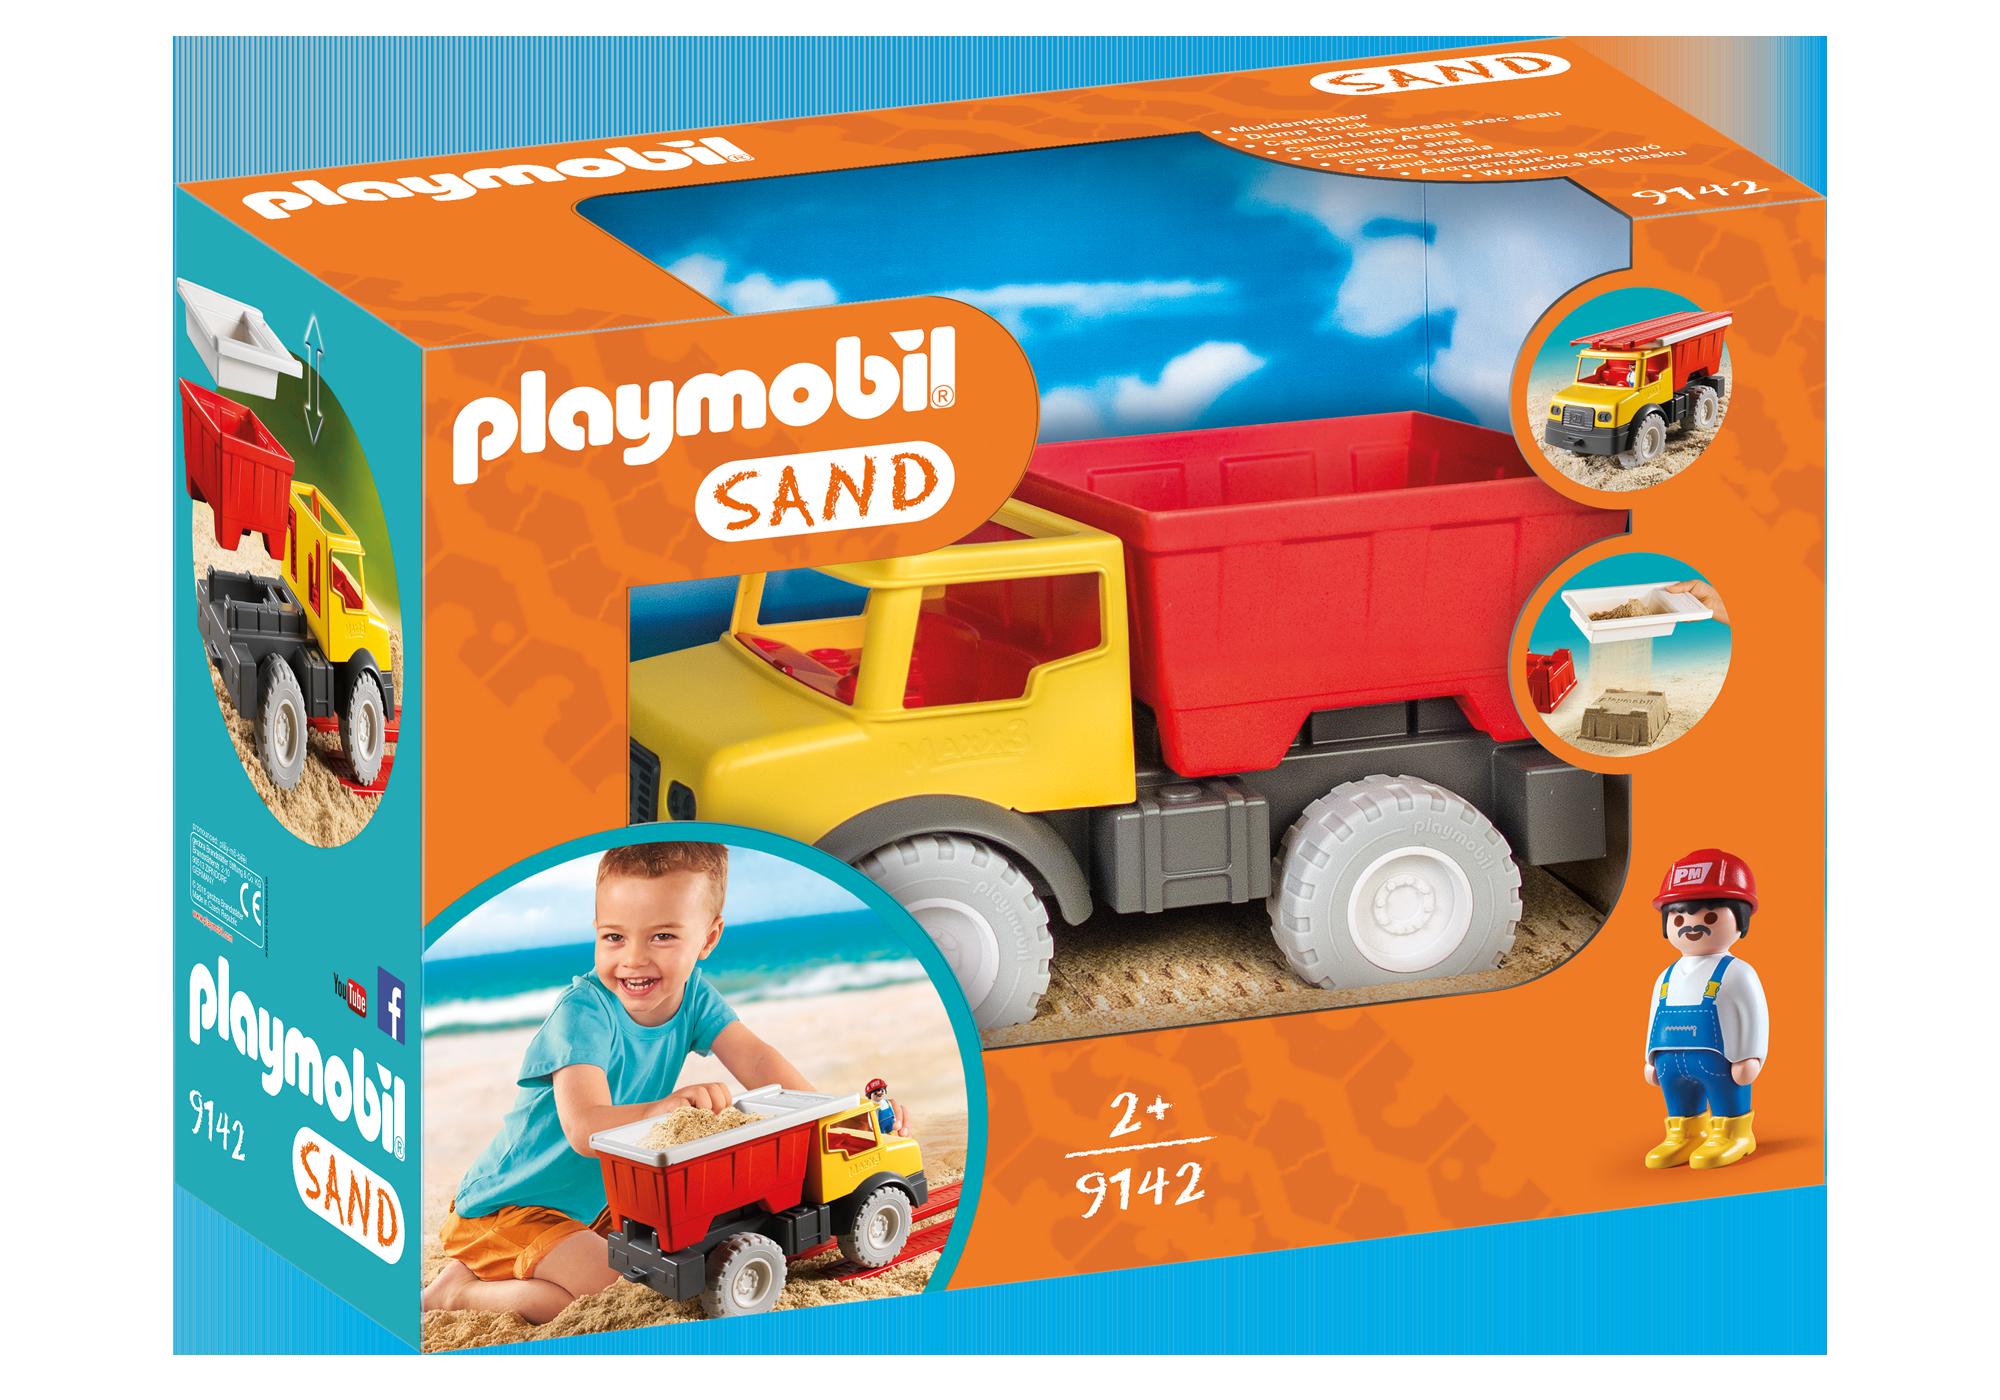 http://media.playmobil.com/i/playmobil/9142_product_box_front/Skraldevogn